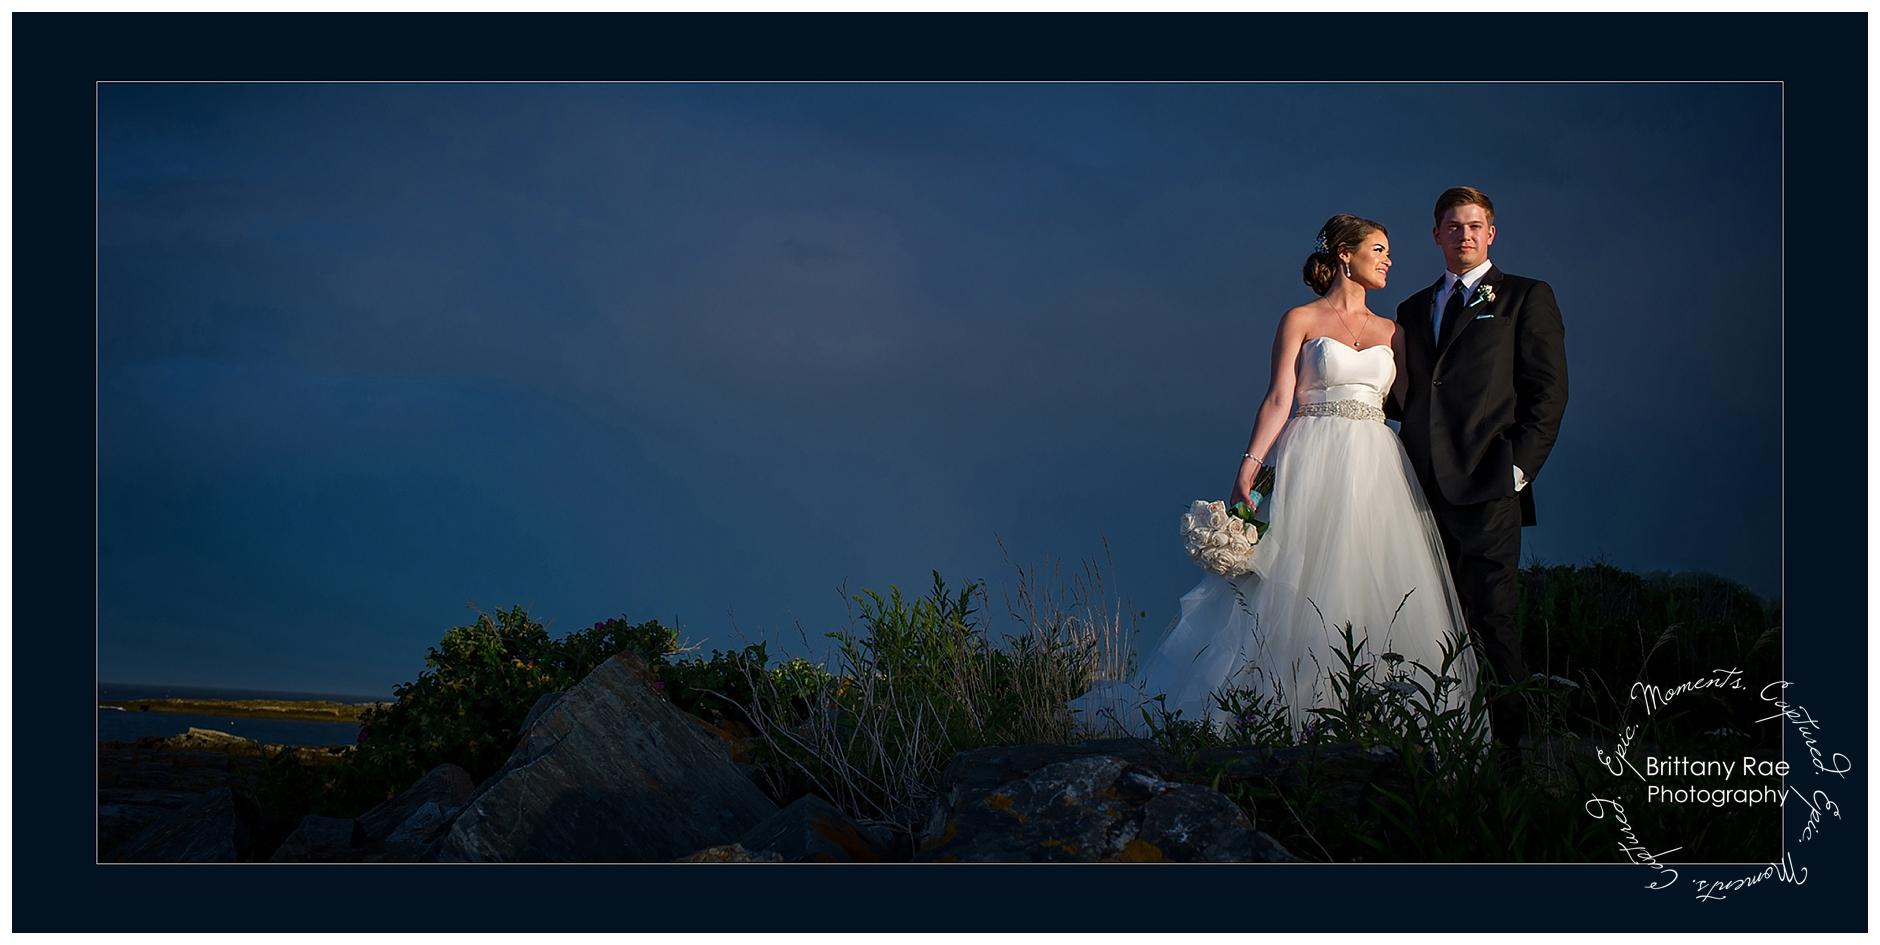 Love-In-The-Sun_WEB-Maine-Wedding-and-Portrait-Photographer.jpg